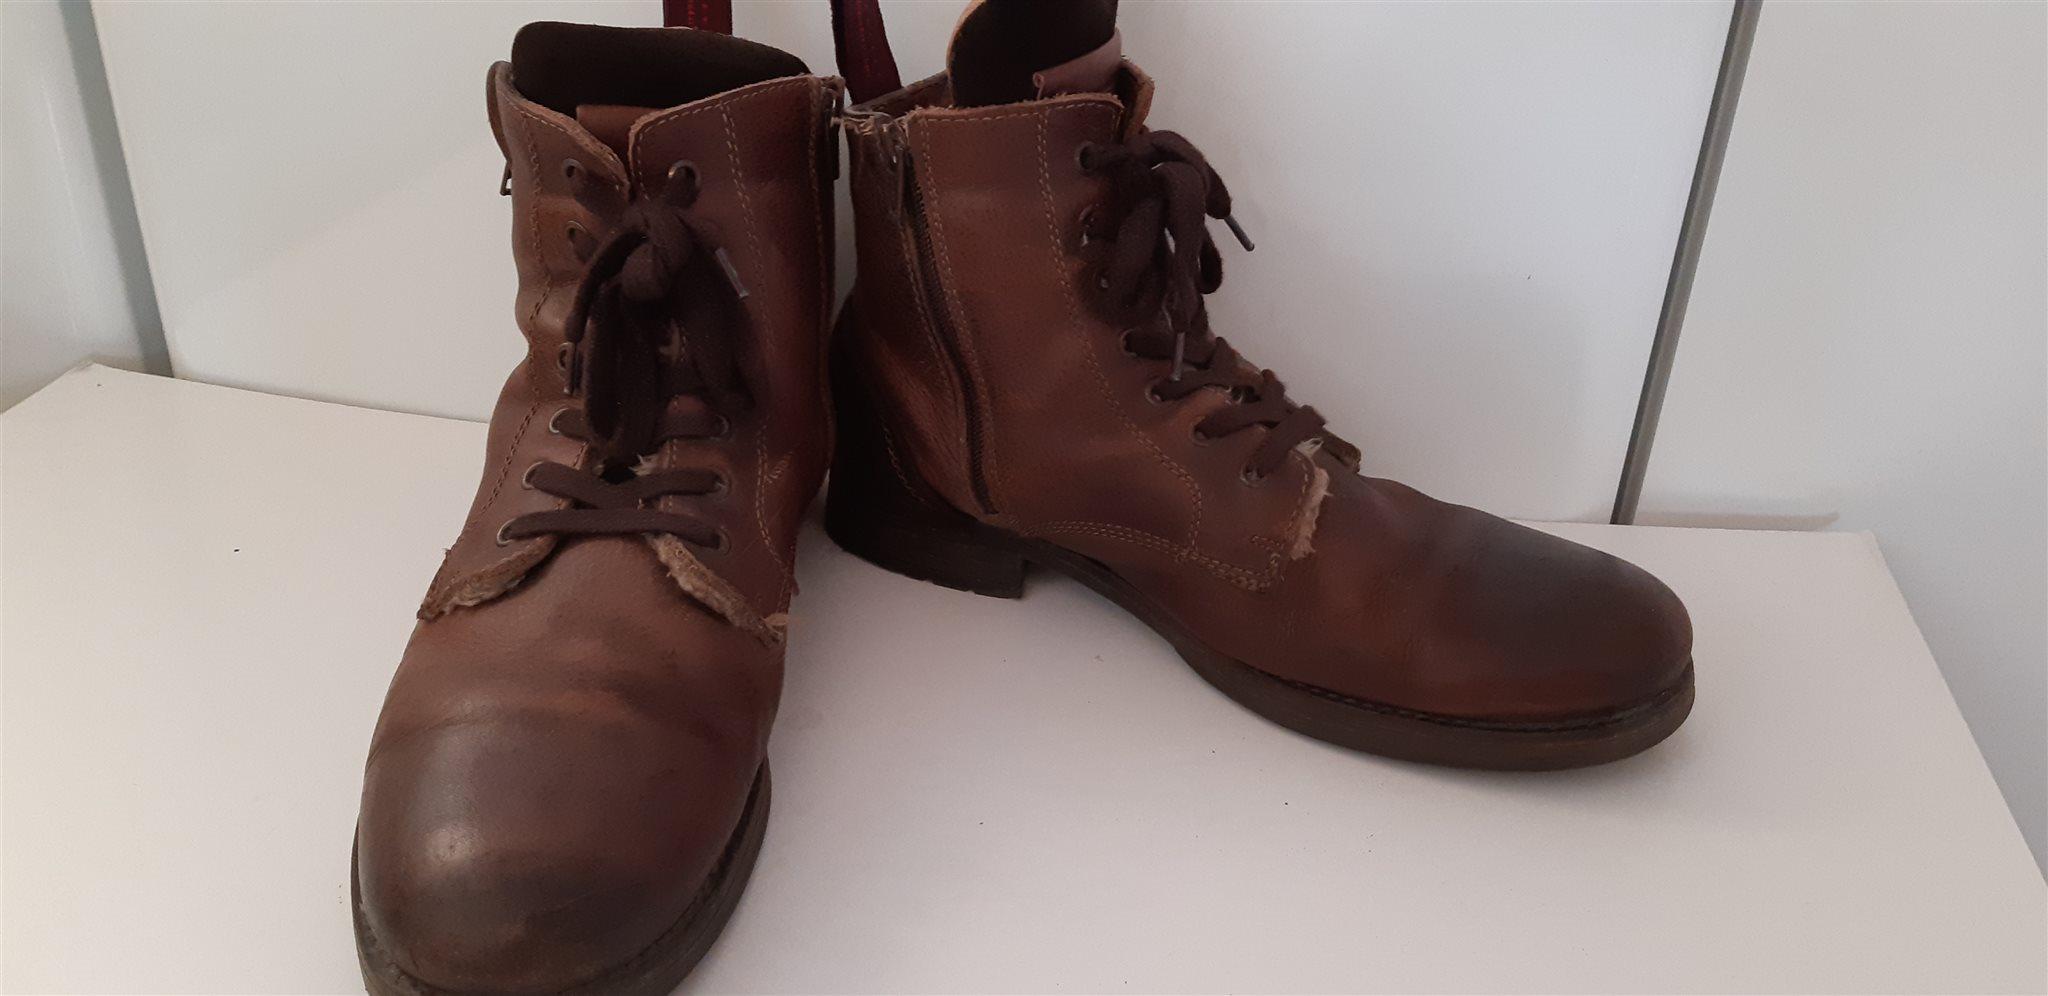 fcefcb0a402 LEGEND varma vinterskor/boots/kängor pälsfoder i äkta läder Strl. 43 ...